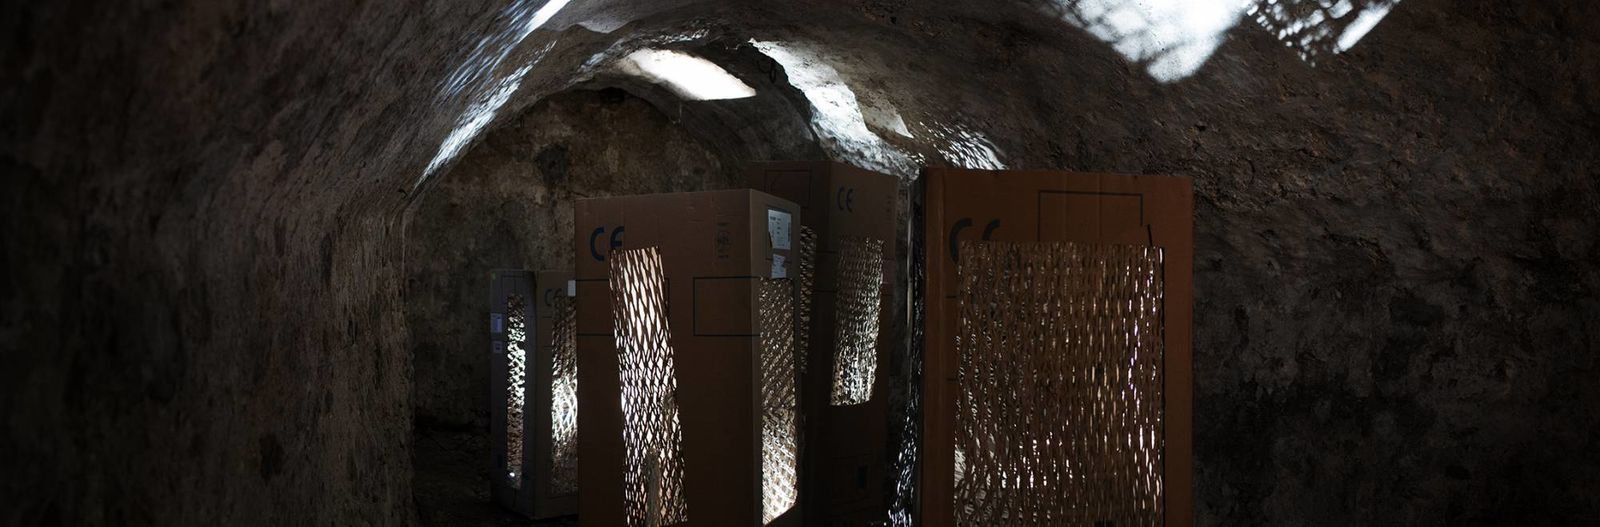 laterna povera, Installation Thayngen